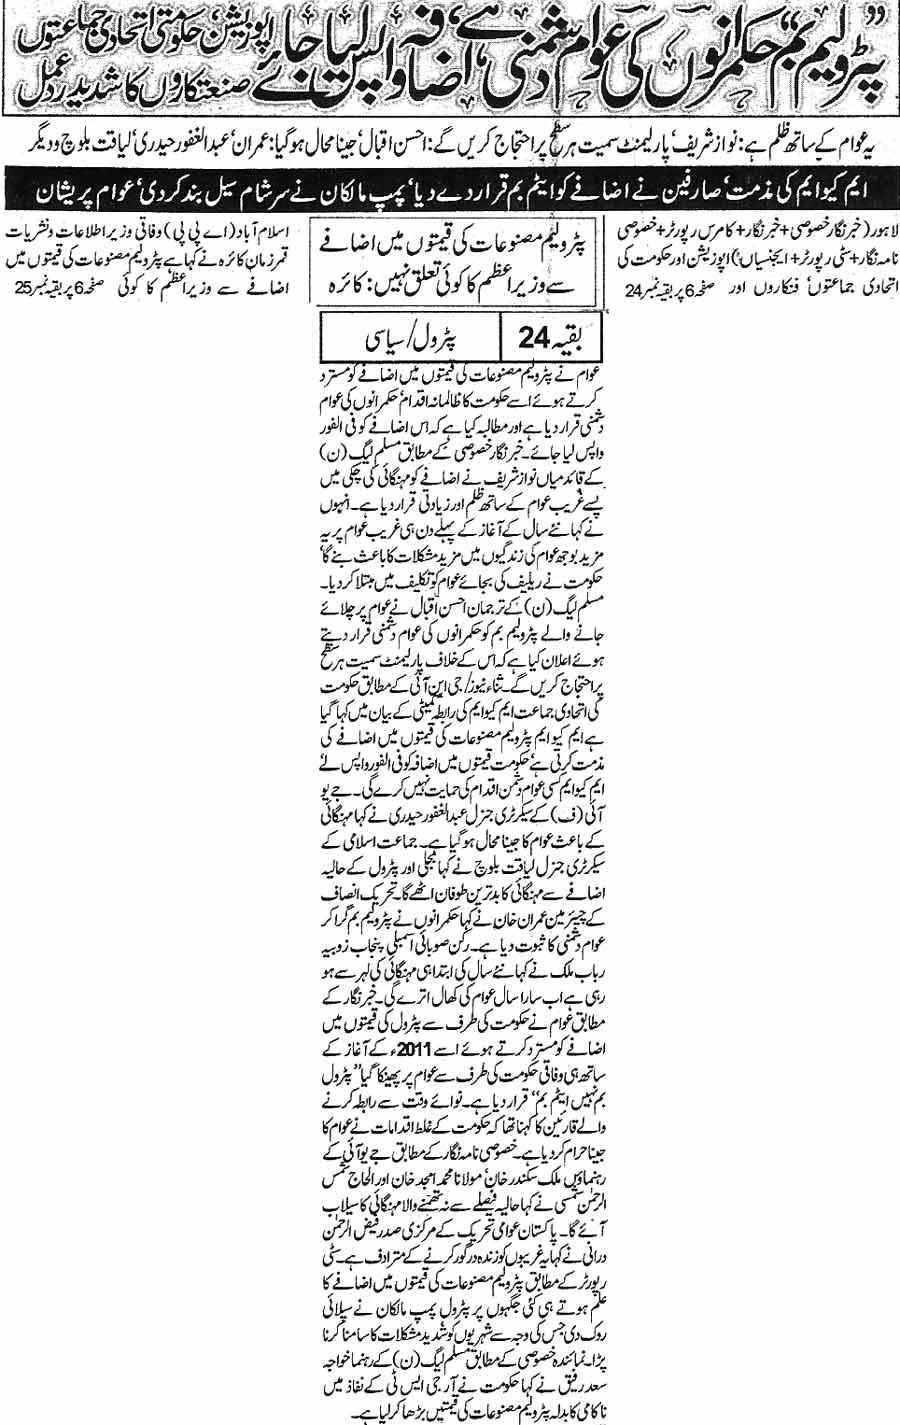 تحریک منہاج القرآن Minhaj-ul-Quran  Print Media Coverage پرنٹ میڈیا کوریج Daily-Nawa-i-Waqt-Page-1